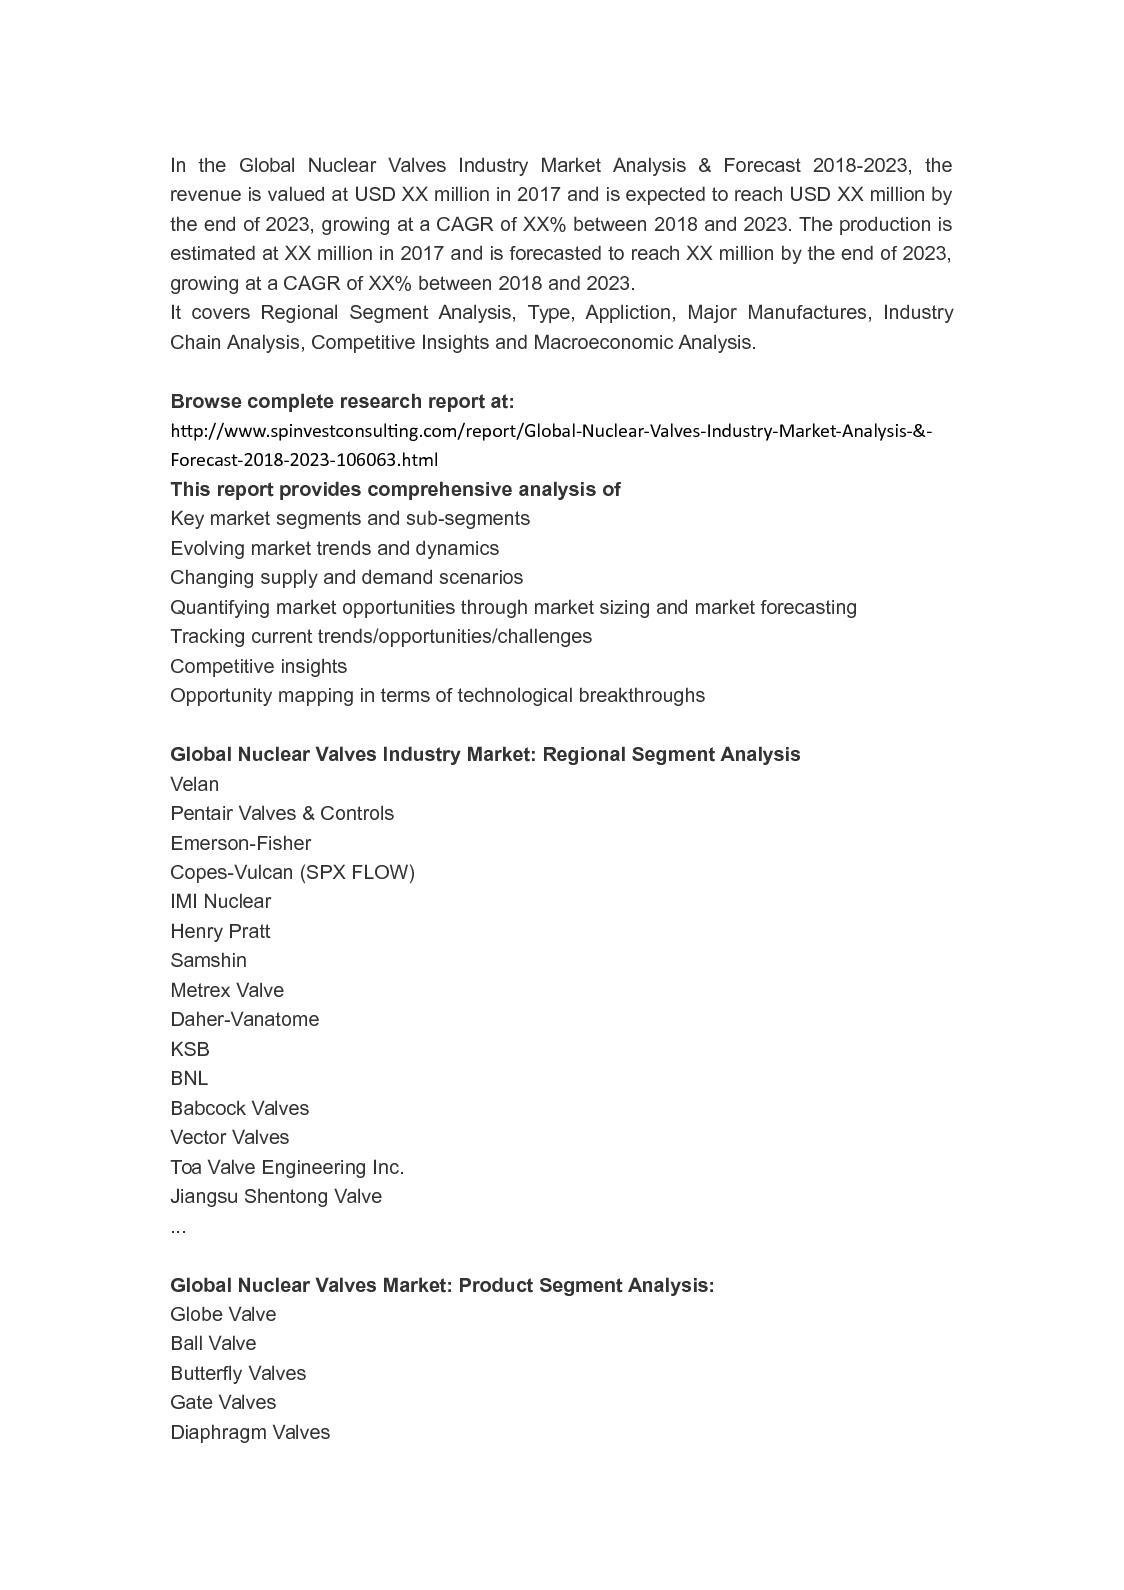 Calaméo - Global Nuclear Valves Industry Market Analysis